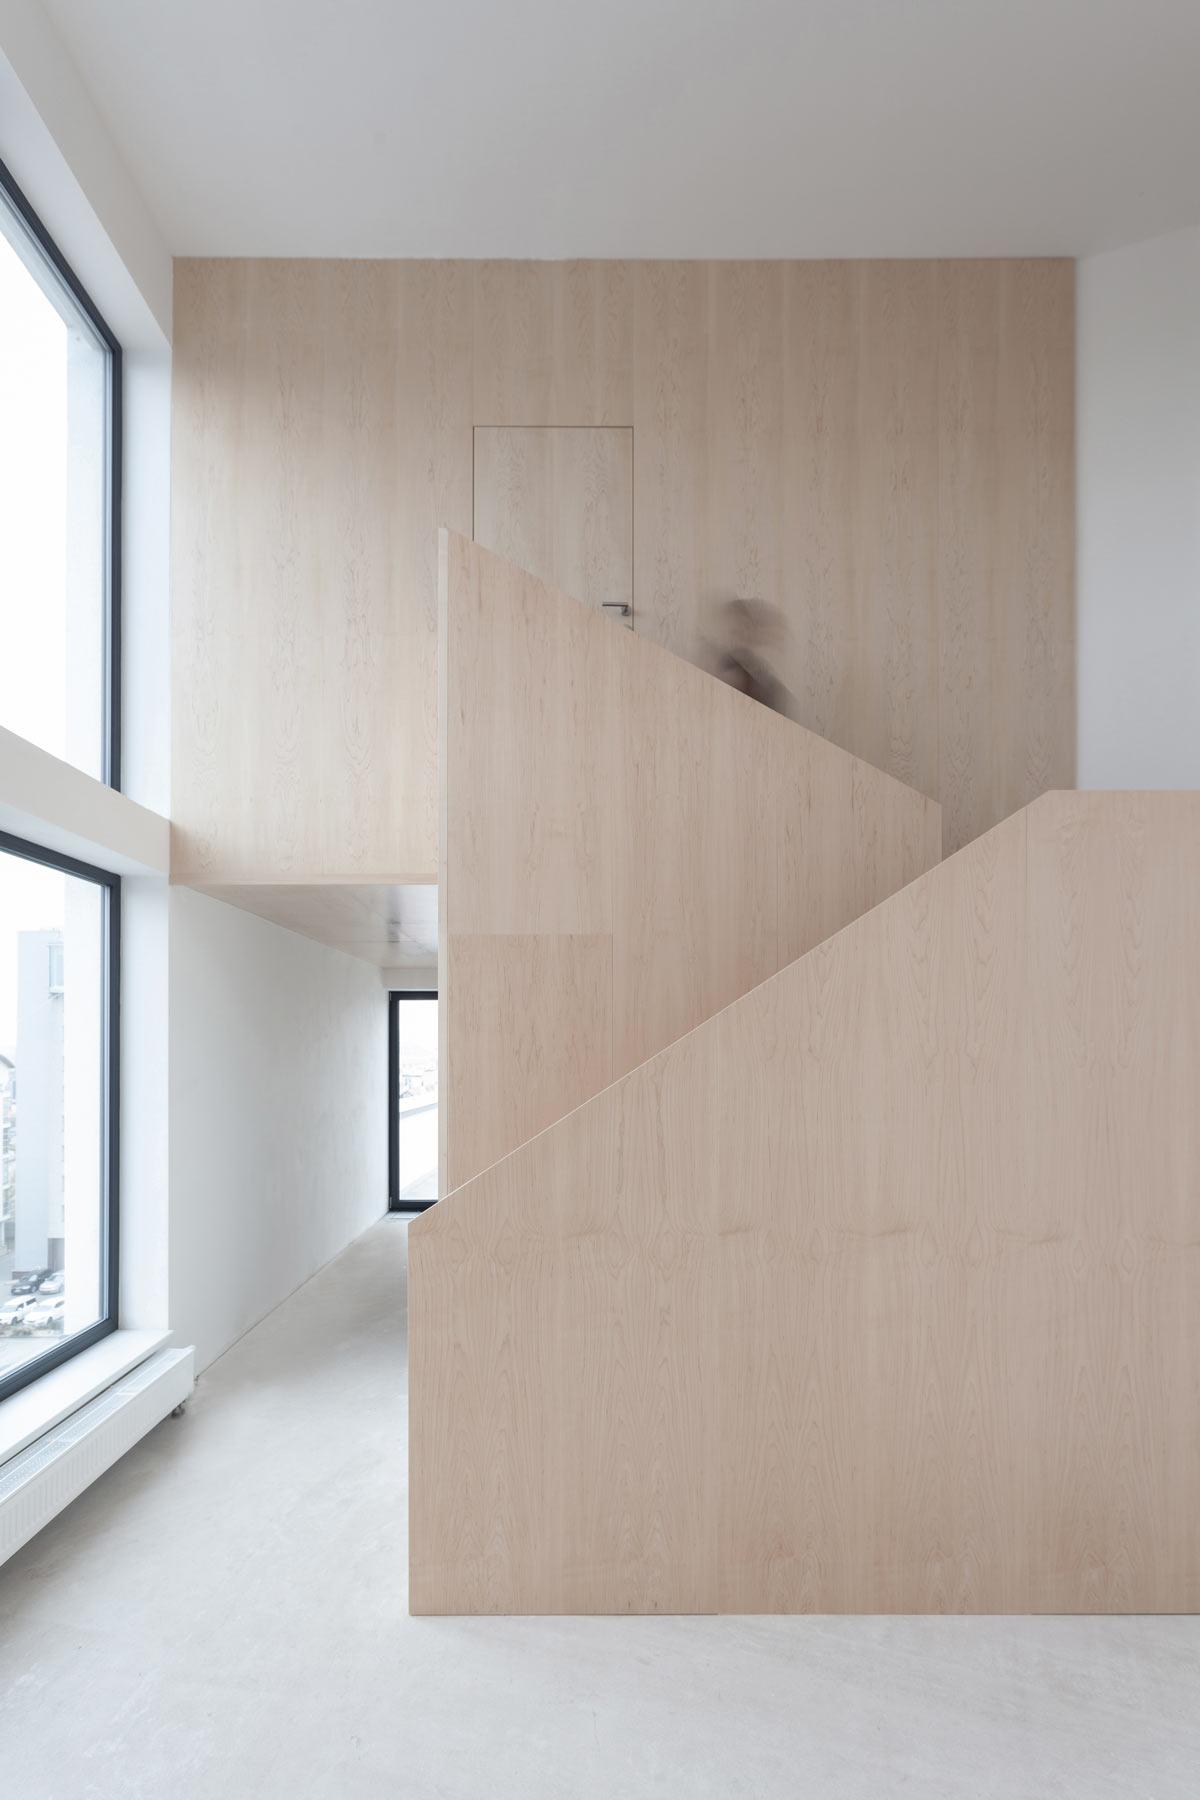 Focus-archi-magazine-architecture-Urban-Infill-Chybik-Kristof-escalier.jpg